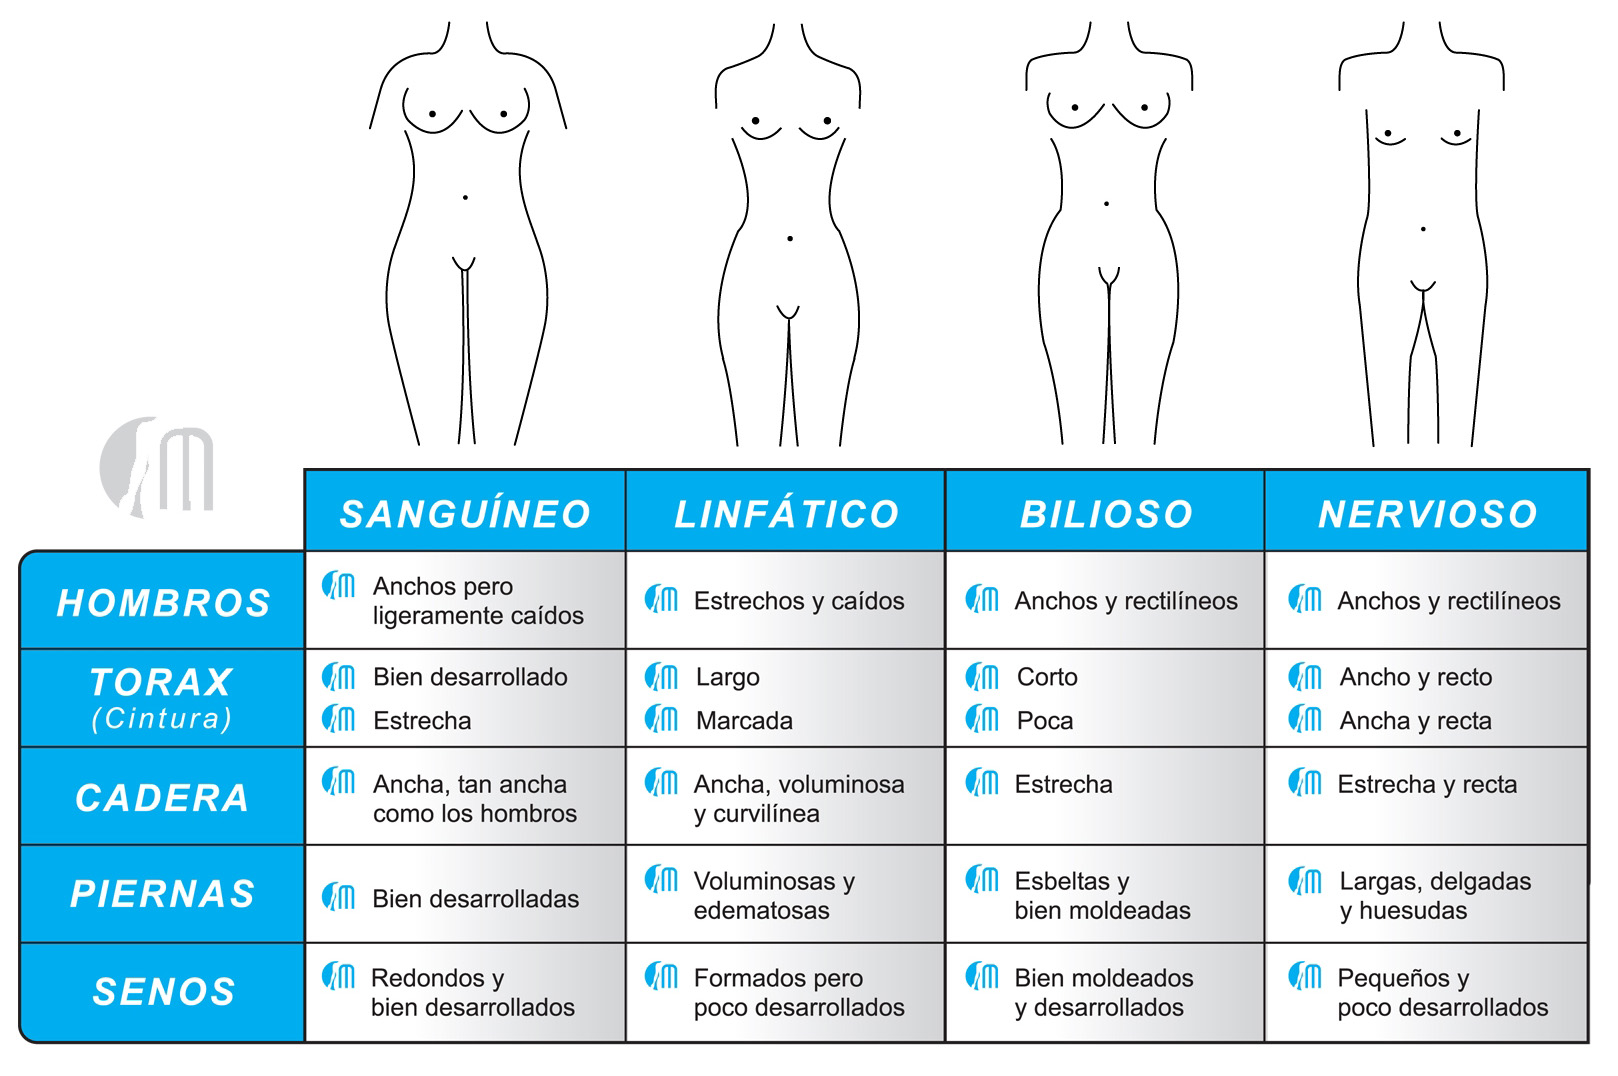 Tabla morfologia